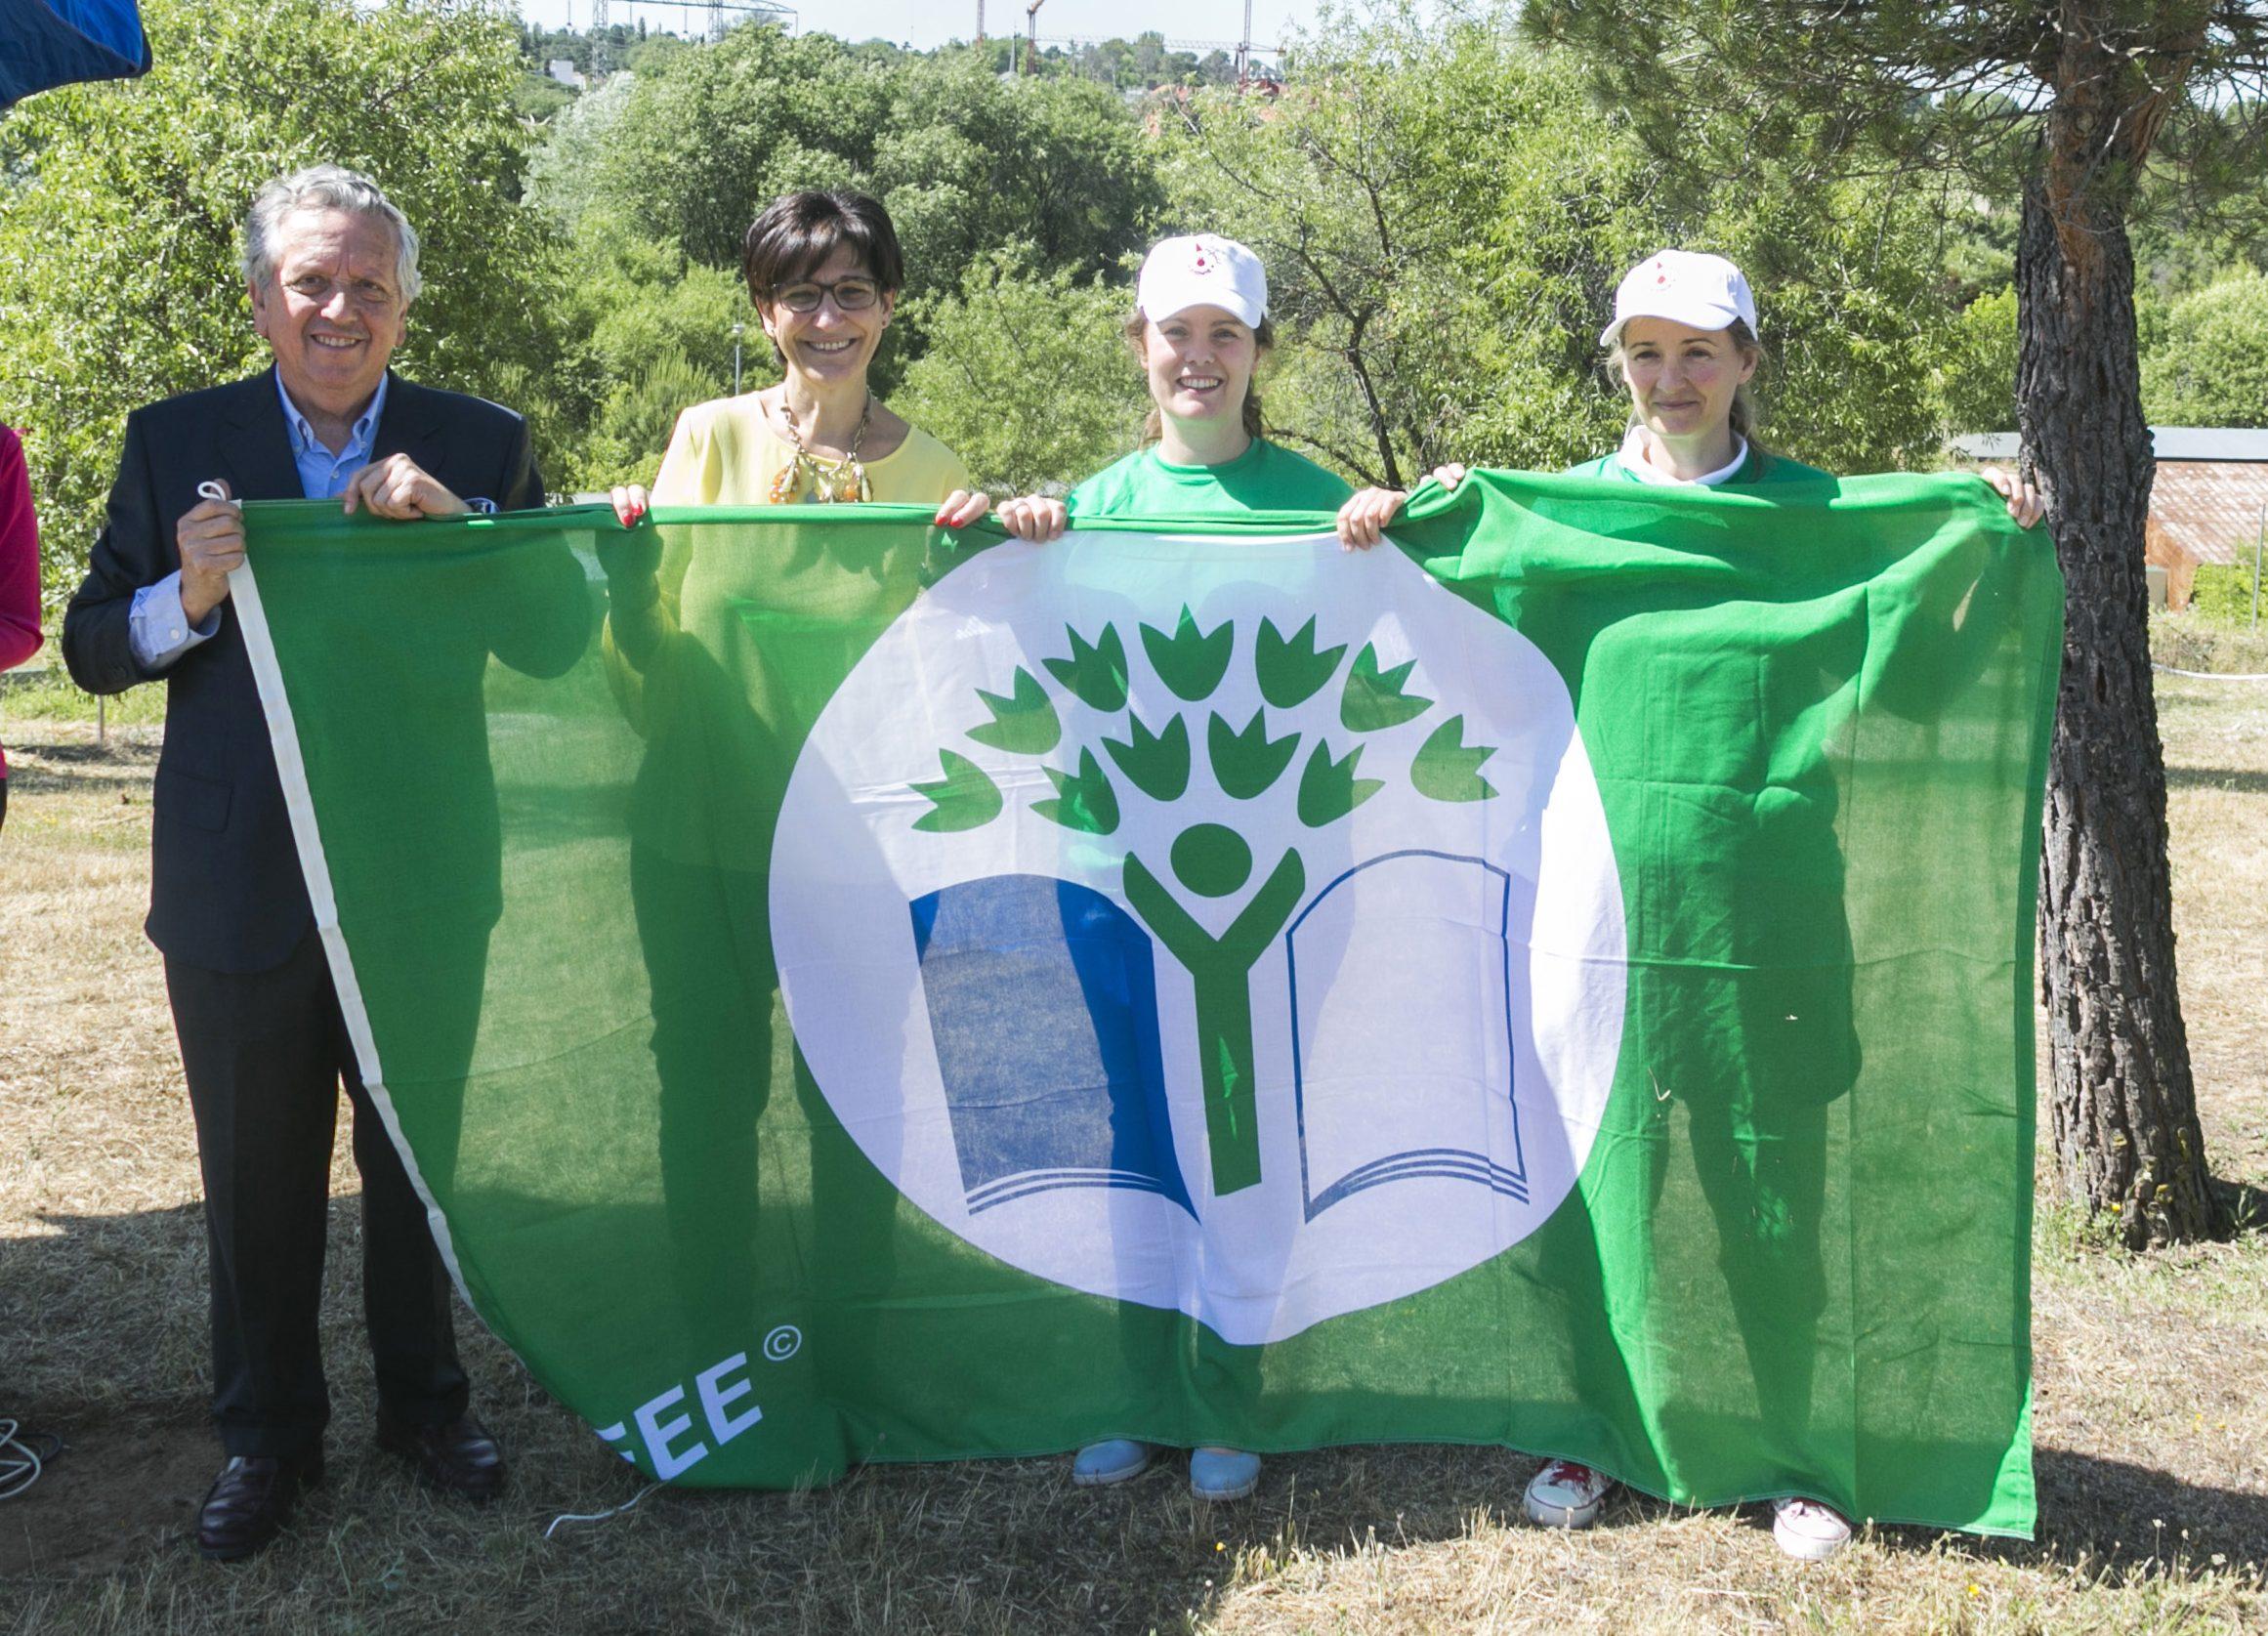 Escuela infantil piquio pozuelo ya tenemos nuestra bandera - Escuela infantil pozuelo ...